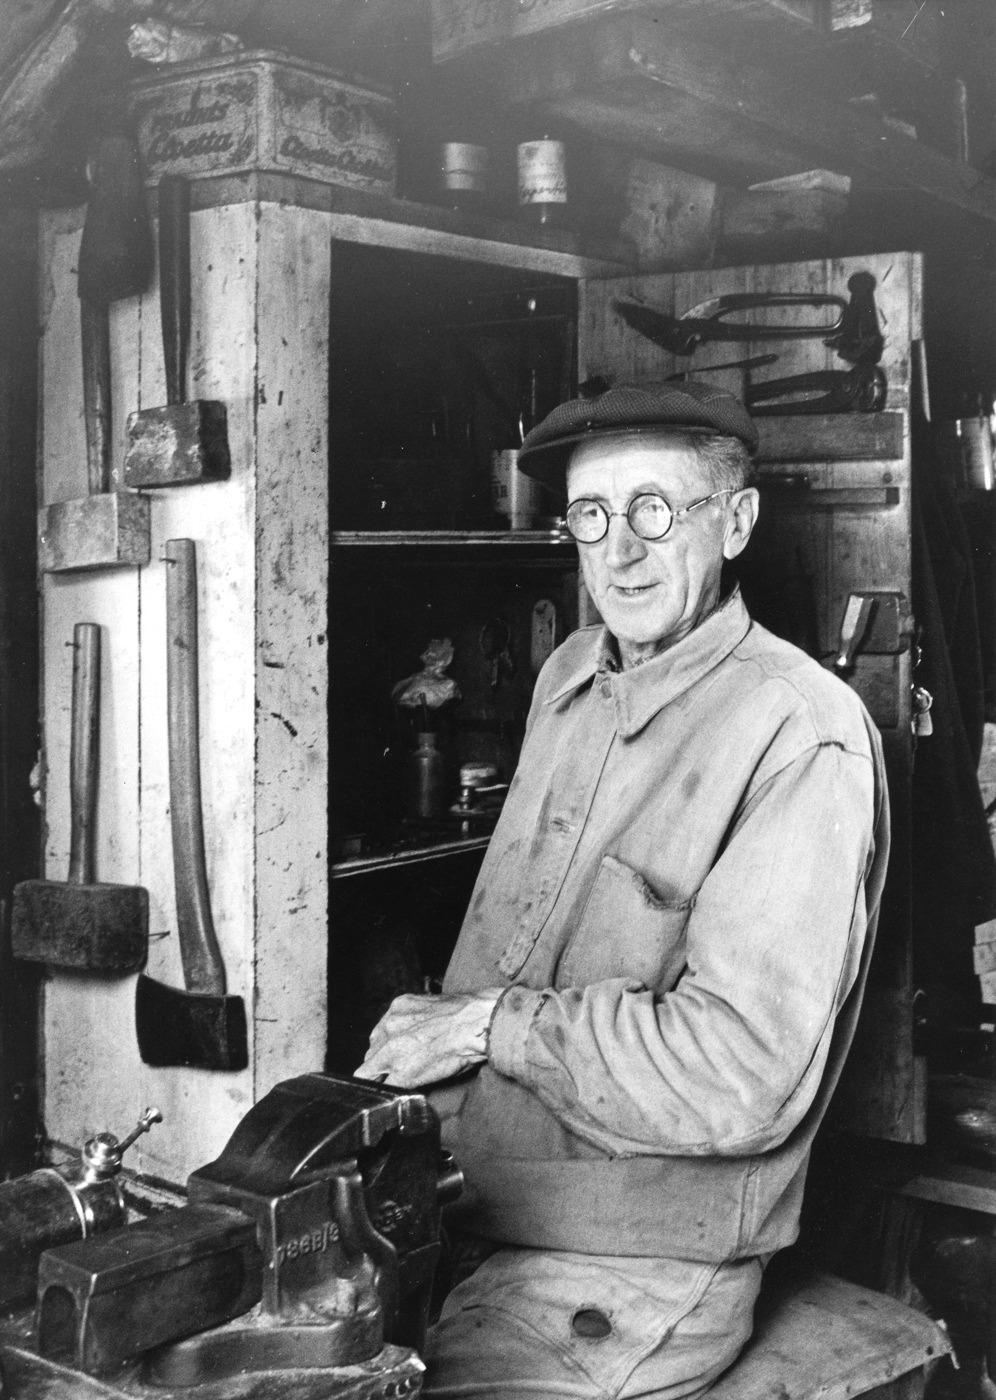 Foto Claes Funck. Amundus Karlsson i verkstaden 1963